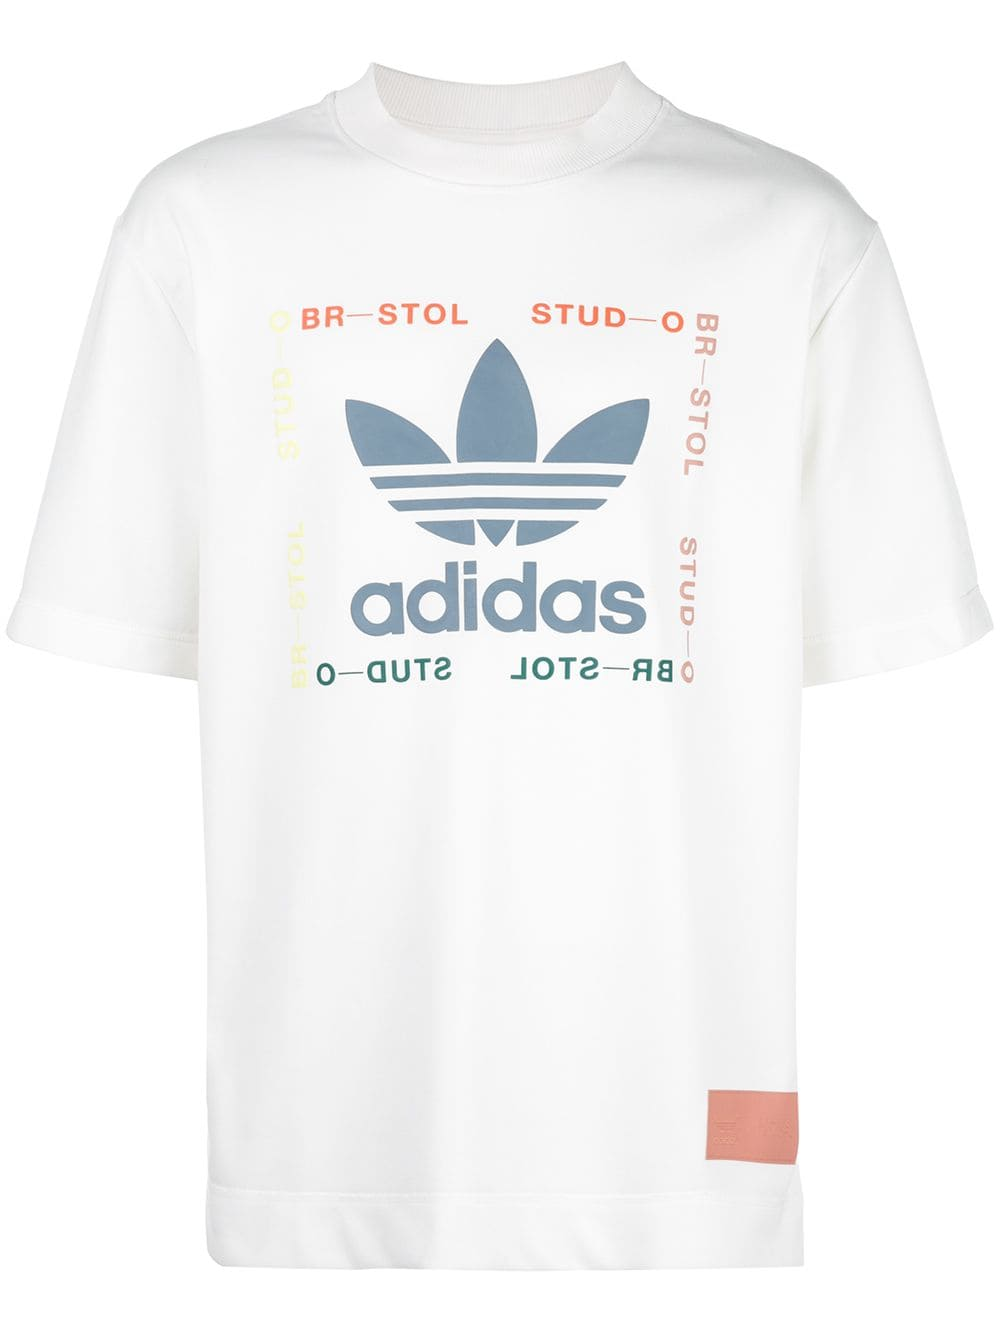 Adidas Logo Print T Shirt Adidas Logo T Shirt Adidas